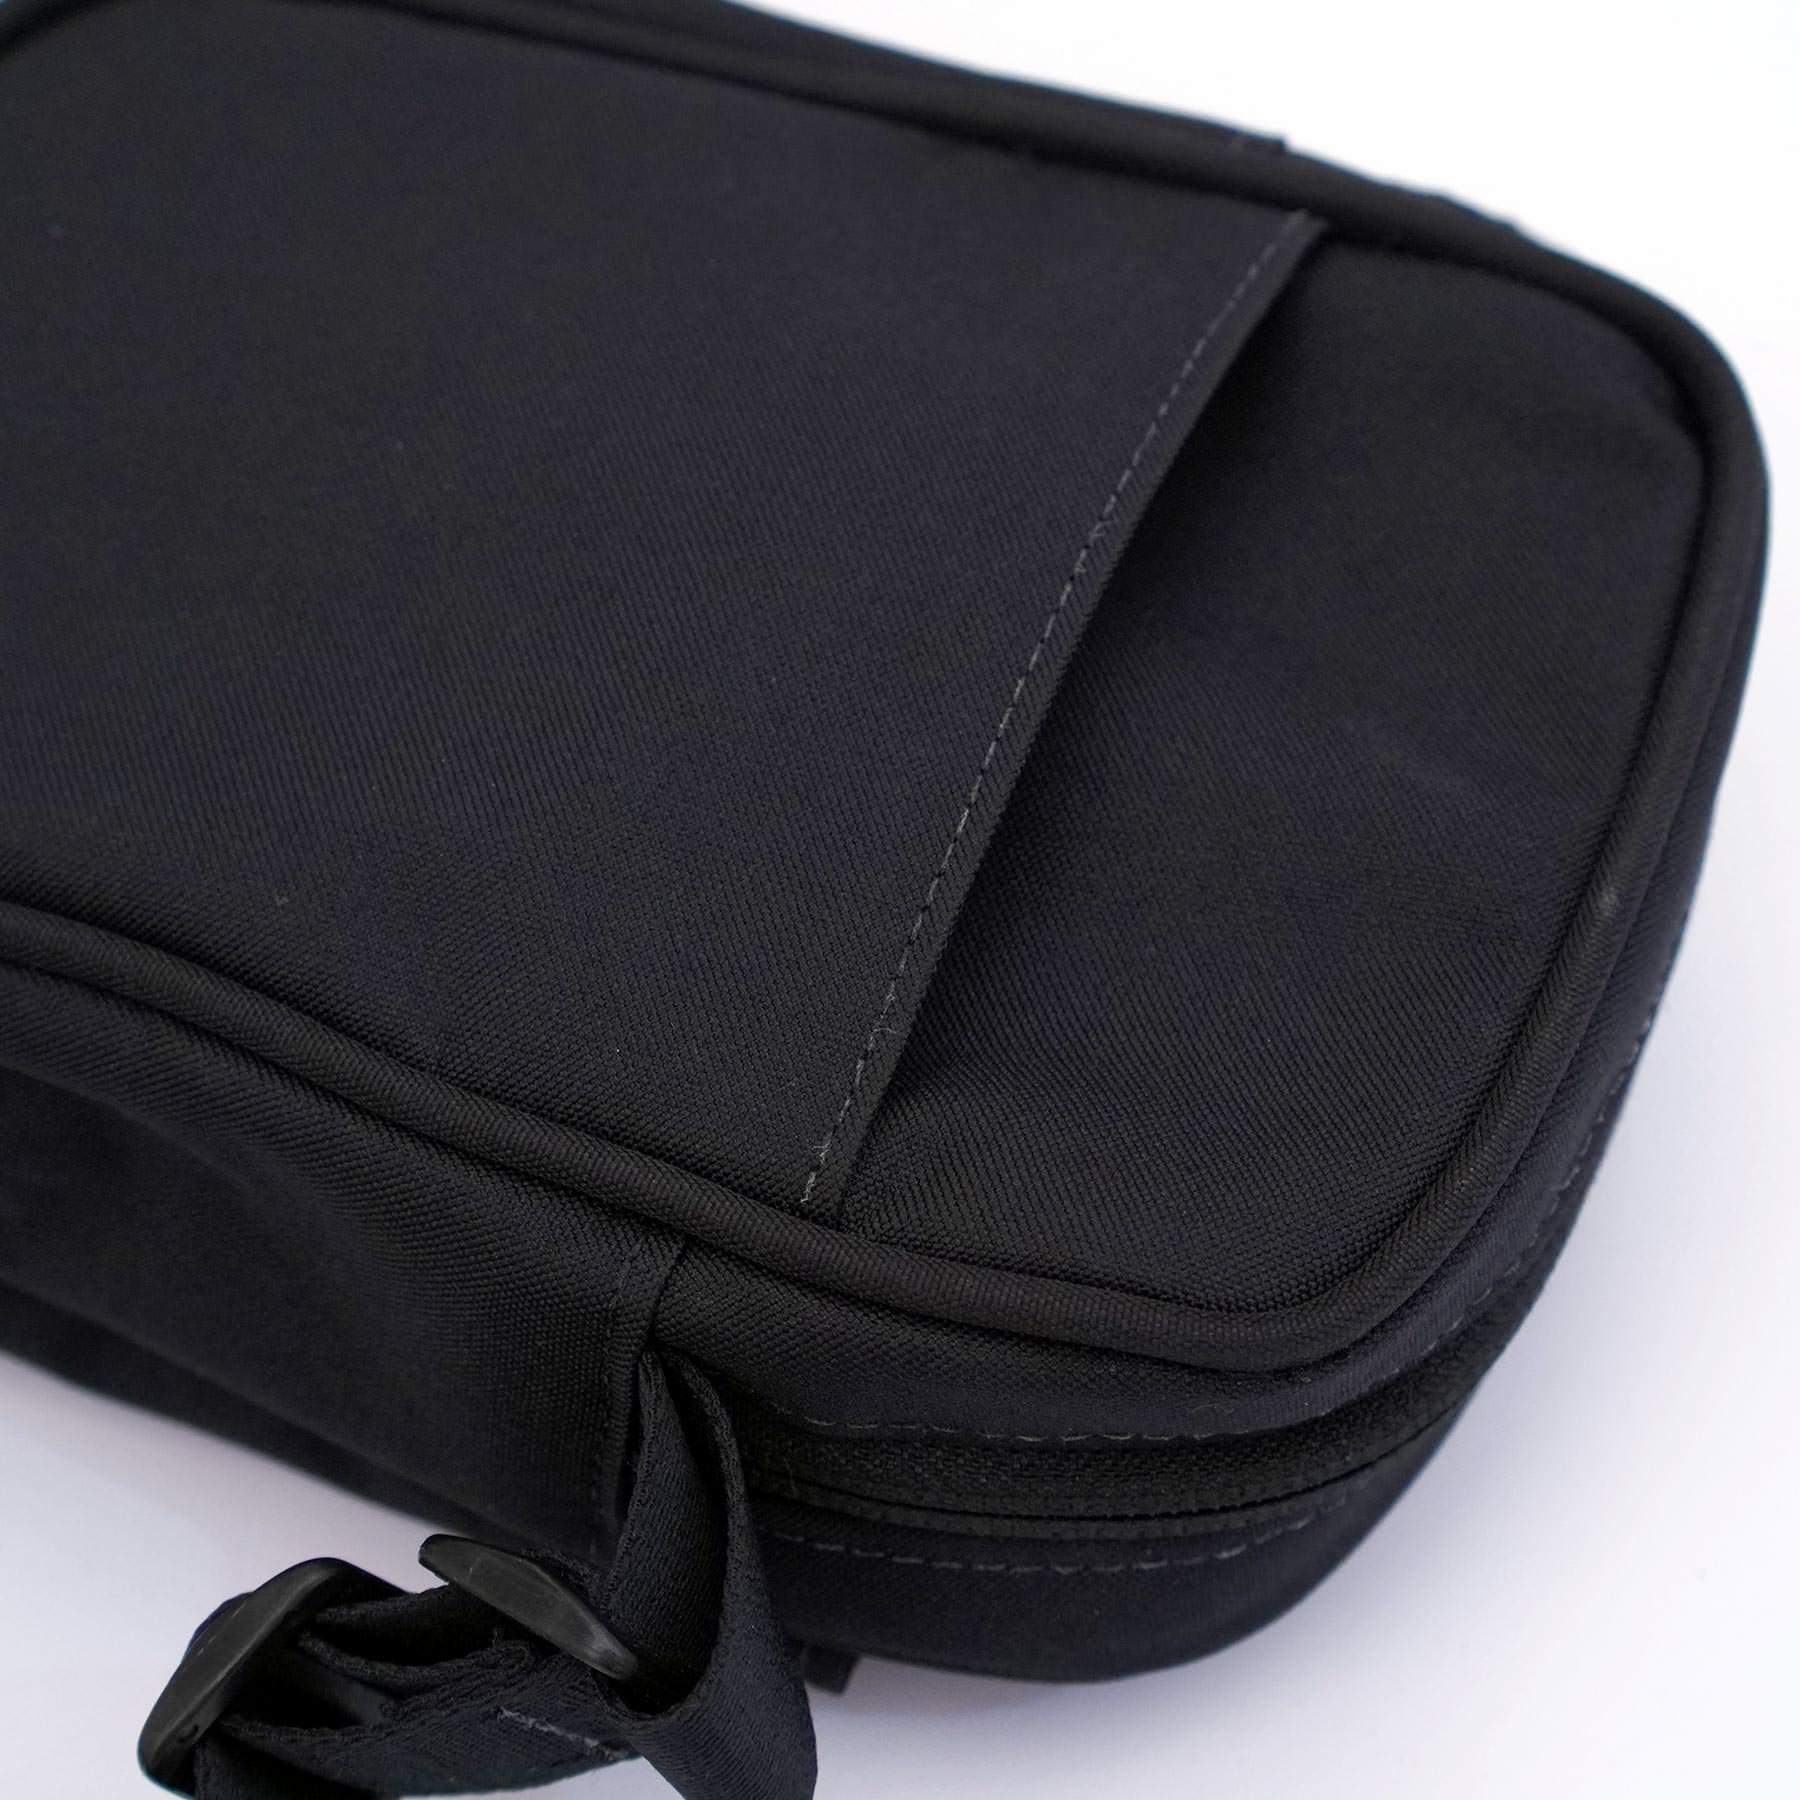 Small_Shoulder_Bag_Black